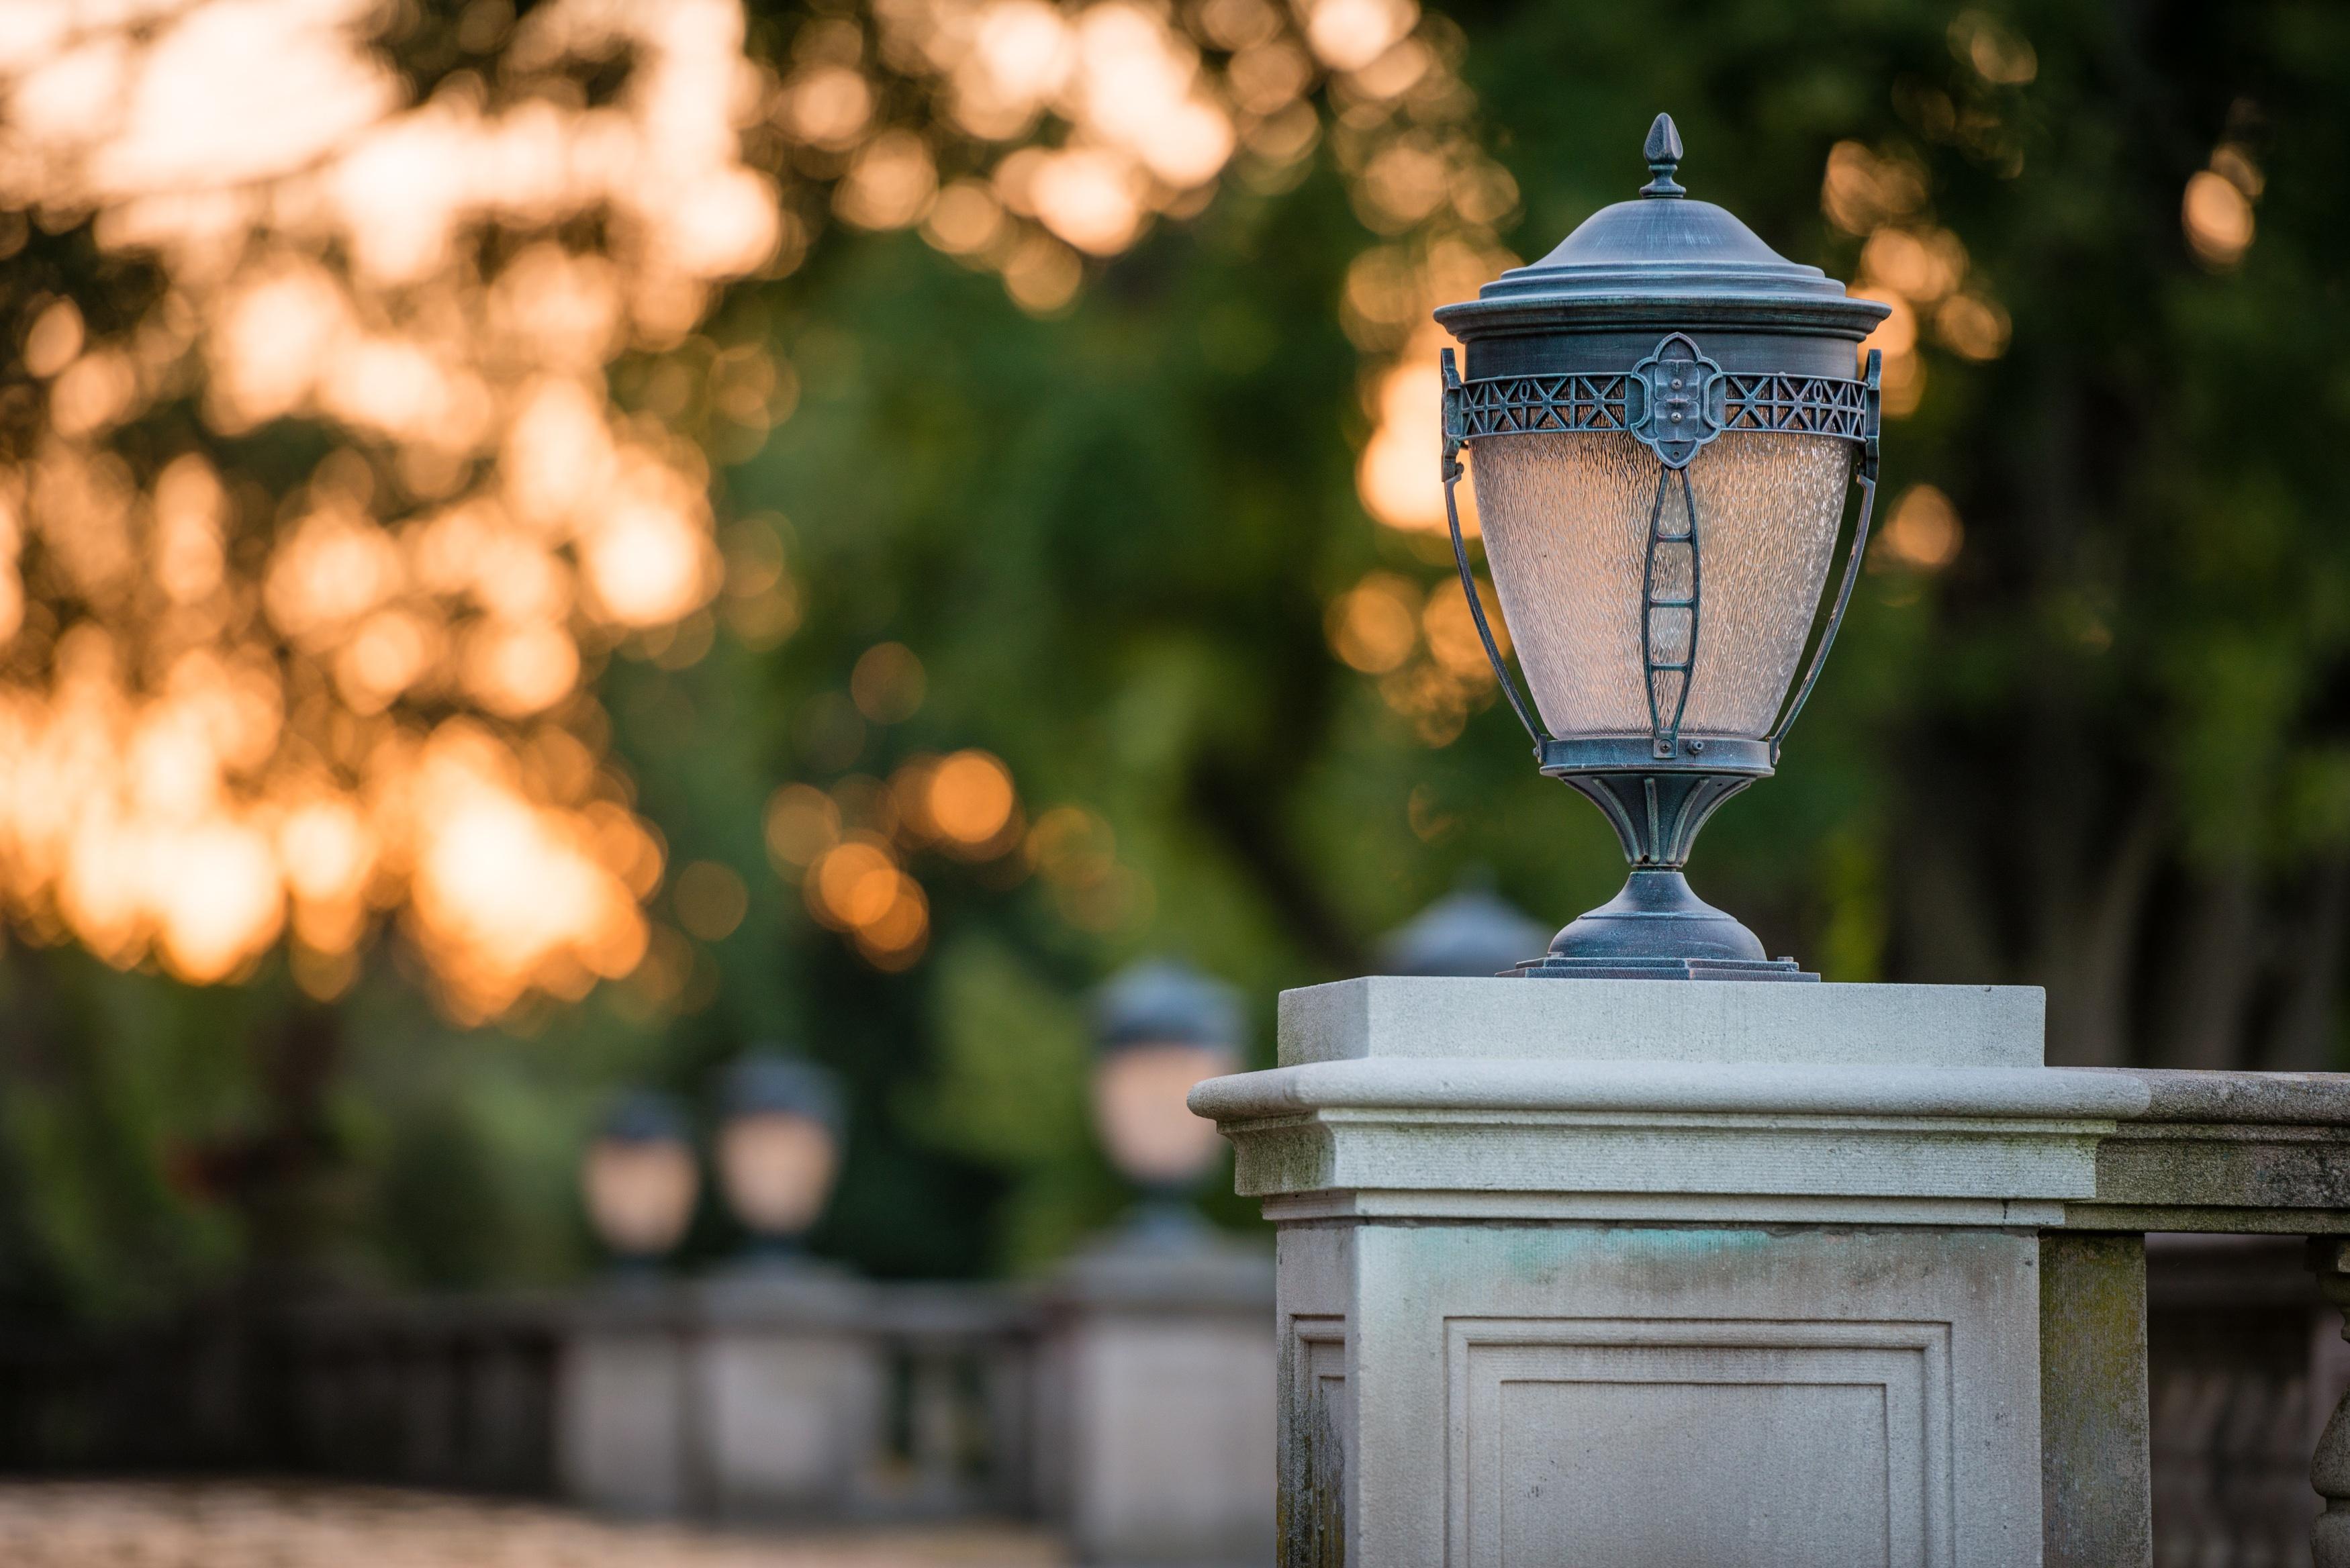 Картинки фонари на улицах в парках